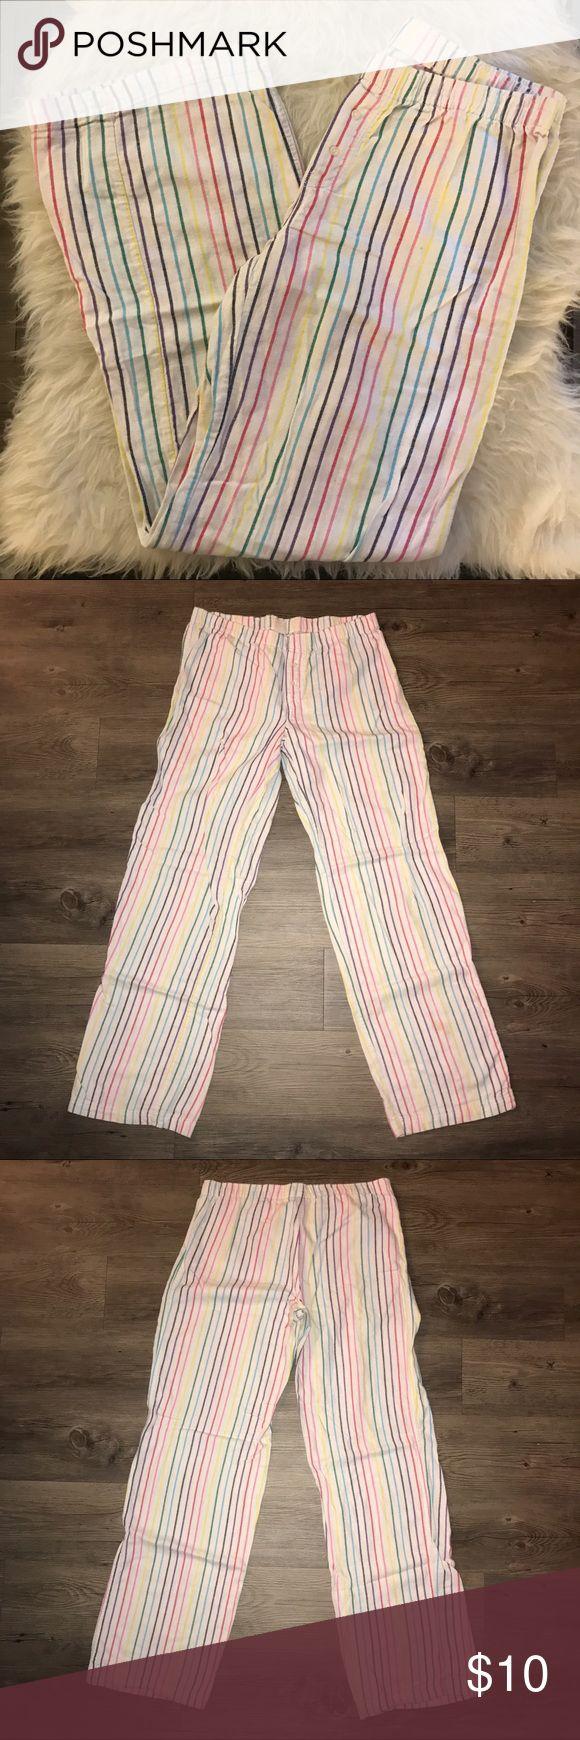 Pink VS Striped pj pants Light piling between legs. Flannel material. Multi colored stripes. PINK Victoria's Secret Intimates & Sleepwear Pajamas